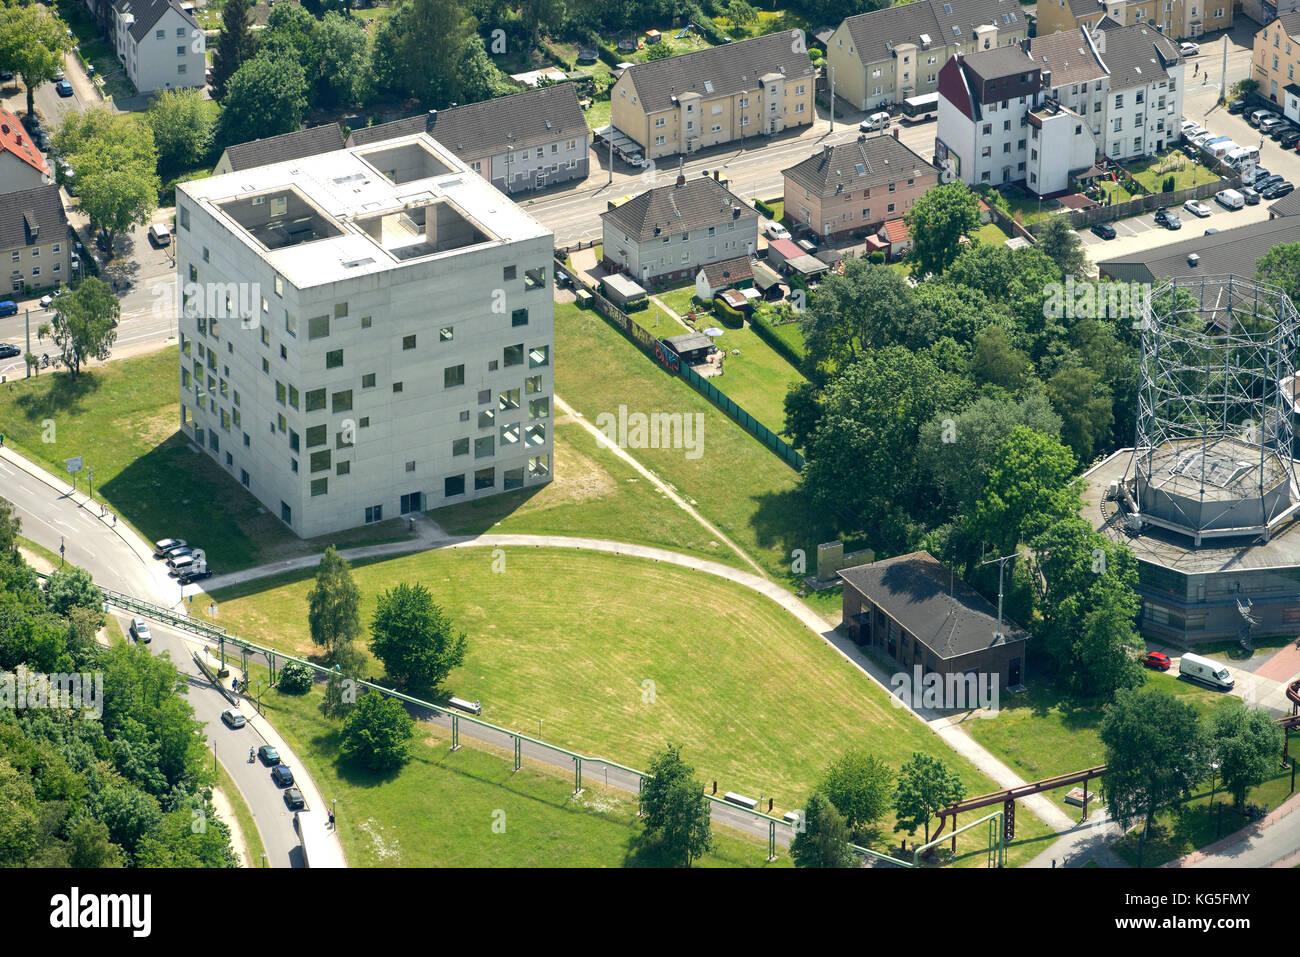 Folkwang Universität der Künste, SANAA-building, Zollverein Coal Mine Industrial Complex, Essen, North - Stock Image